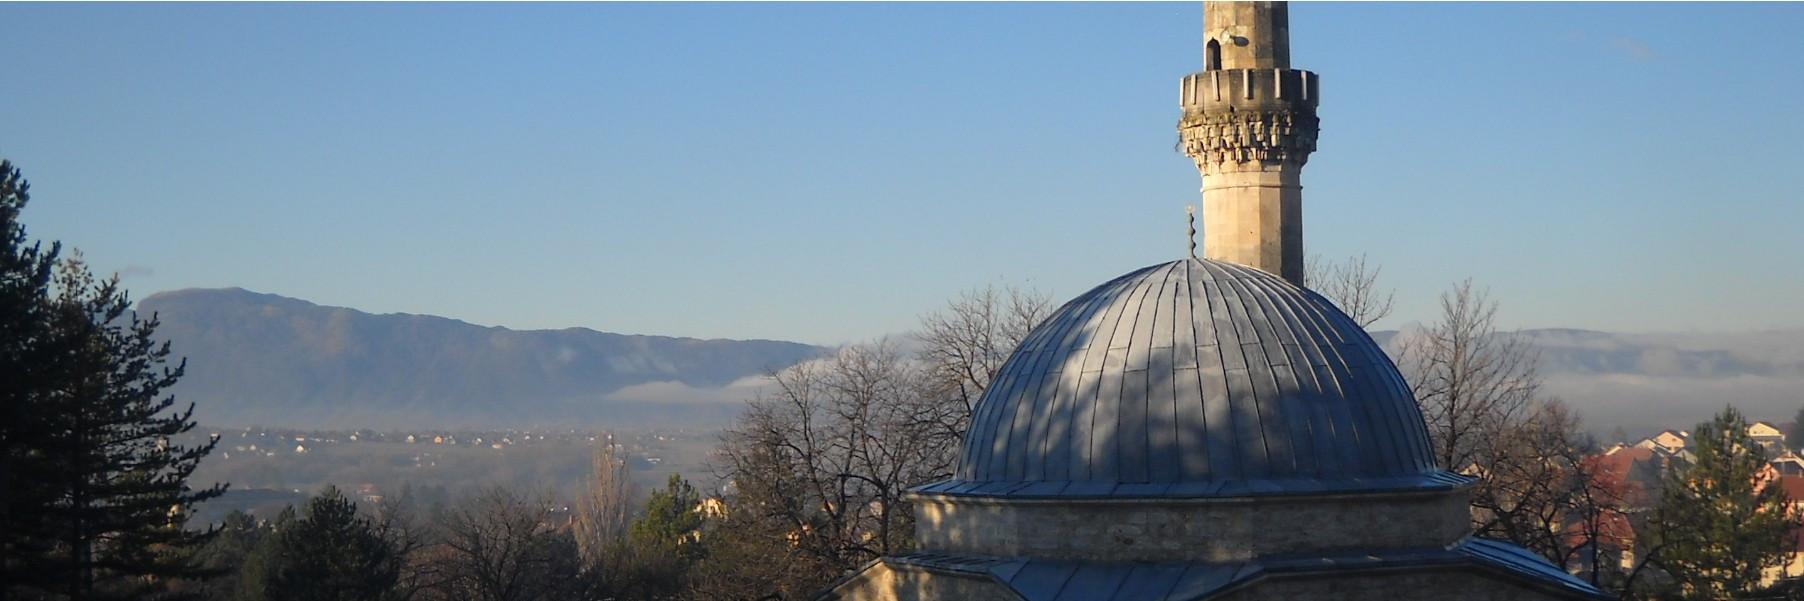 Мечеть Лала-паши. Фото: Елена Арсениевич, CC BY-SA 3.0